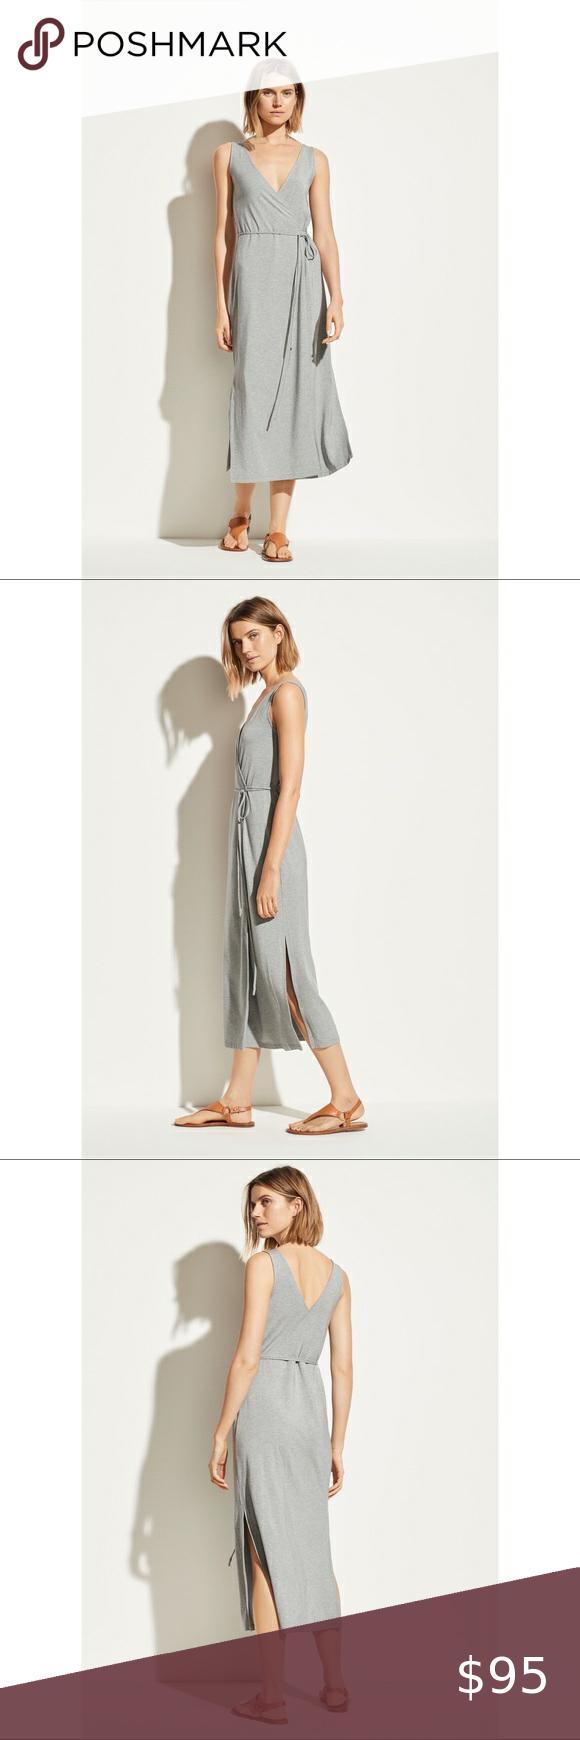 New Vince V Neck Wrap Dress Jersey Knit Dress Swirl Dress Sleeveless Wrap Dress [ 1740 x 580 Pixel ]